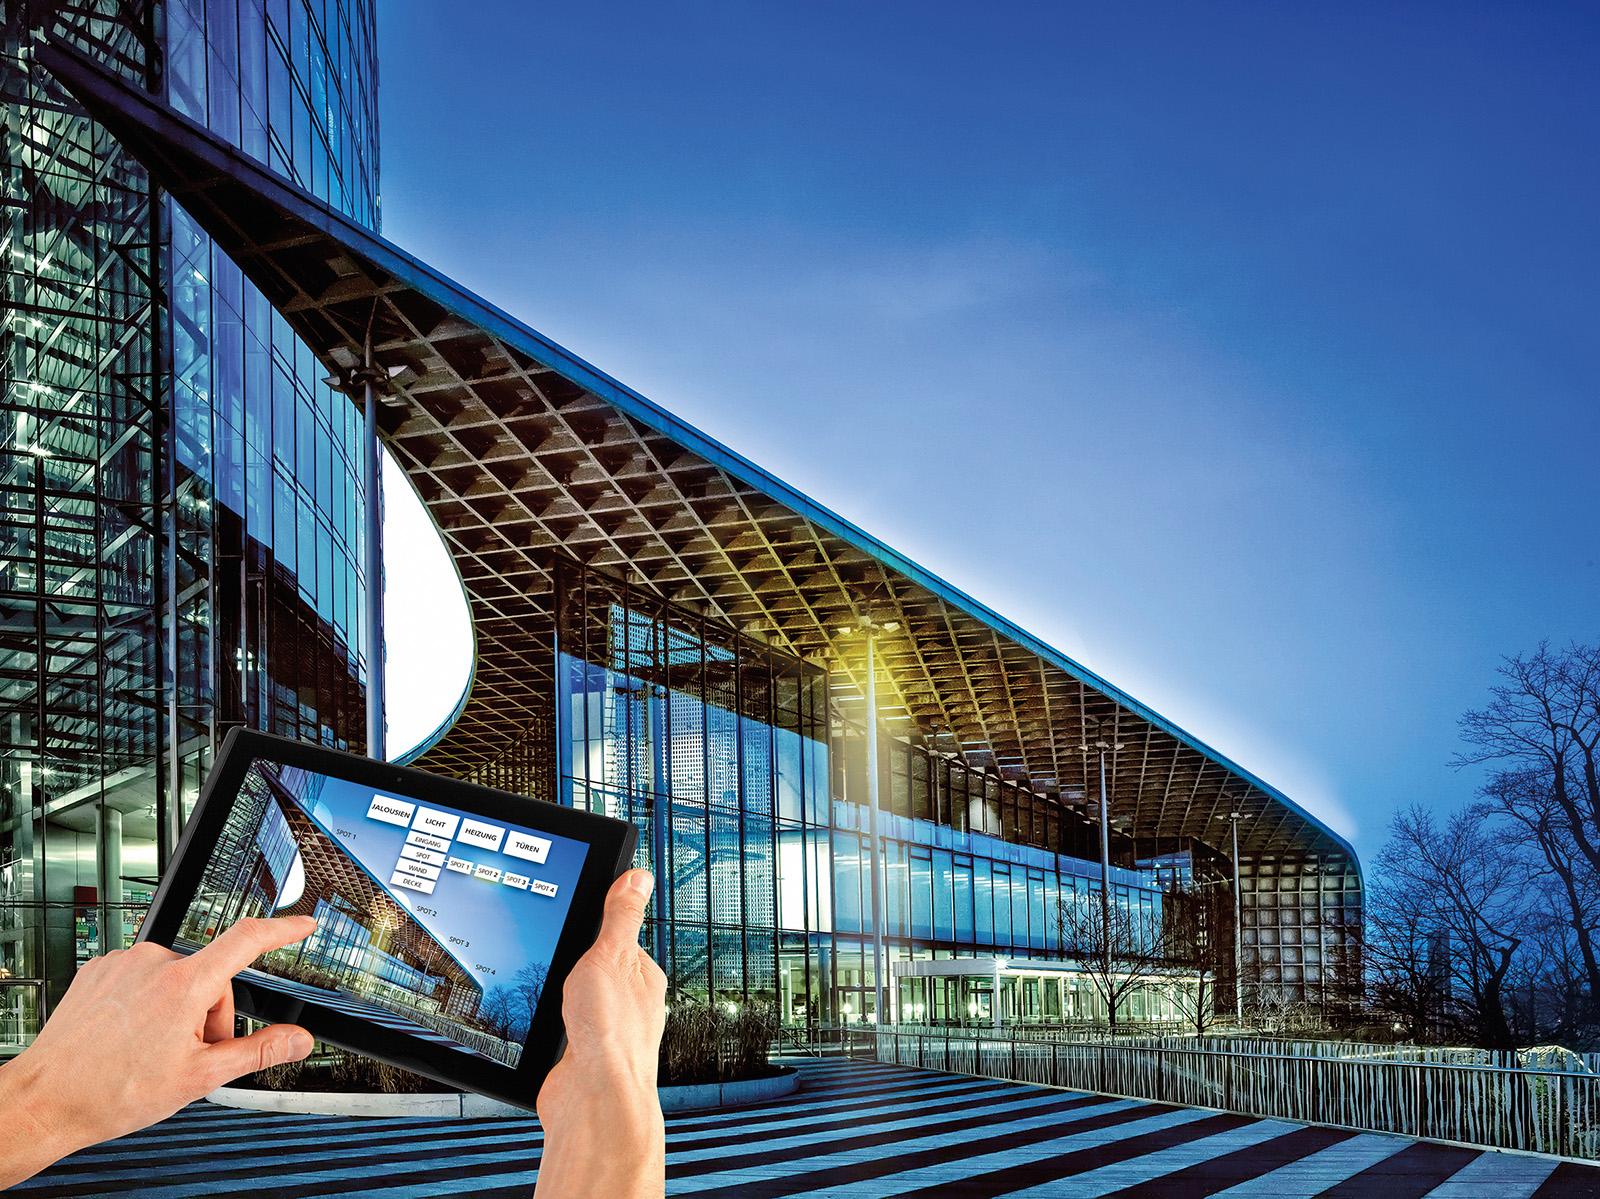 Uitfasering GSM-netwerk: regeren is vooruitzien | Pushing the limits of communication technology | MCS